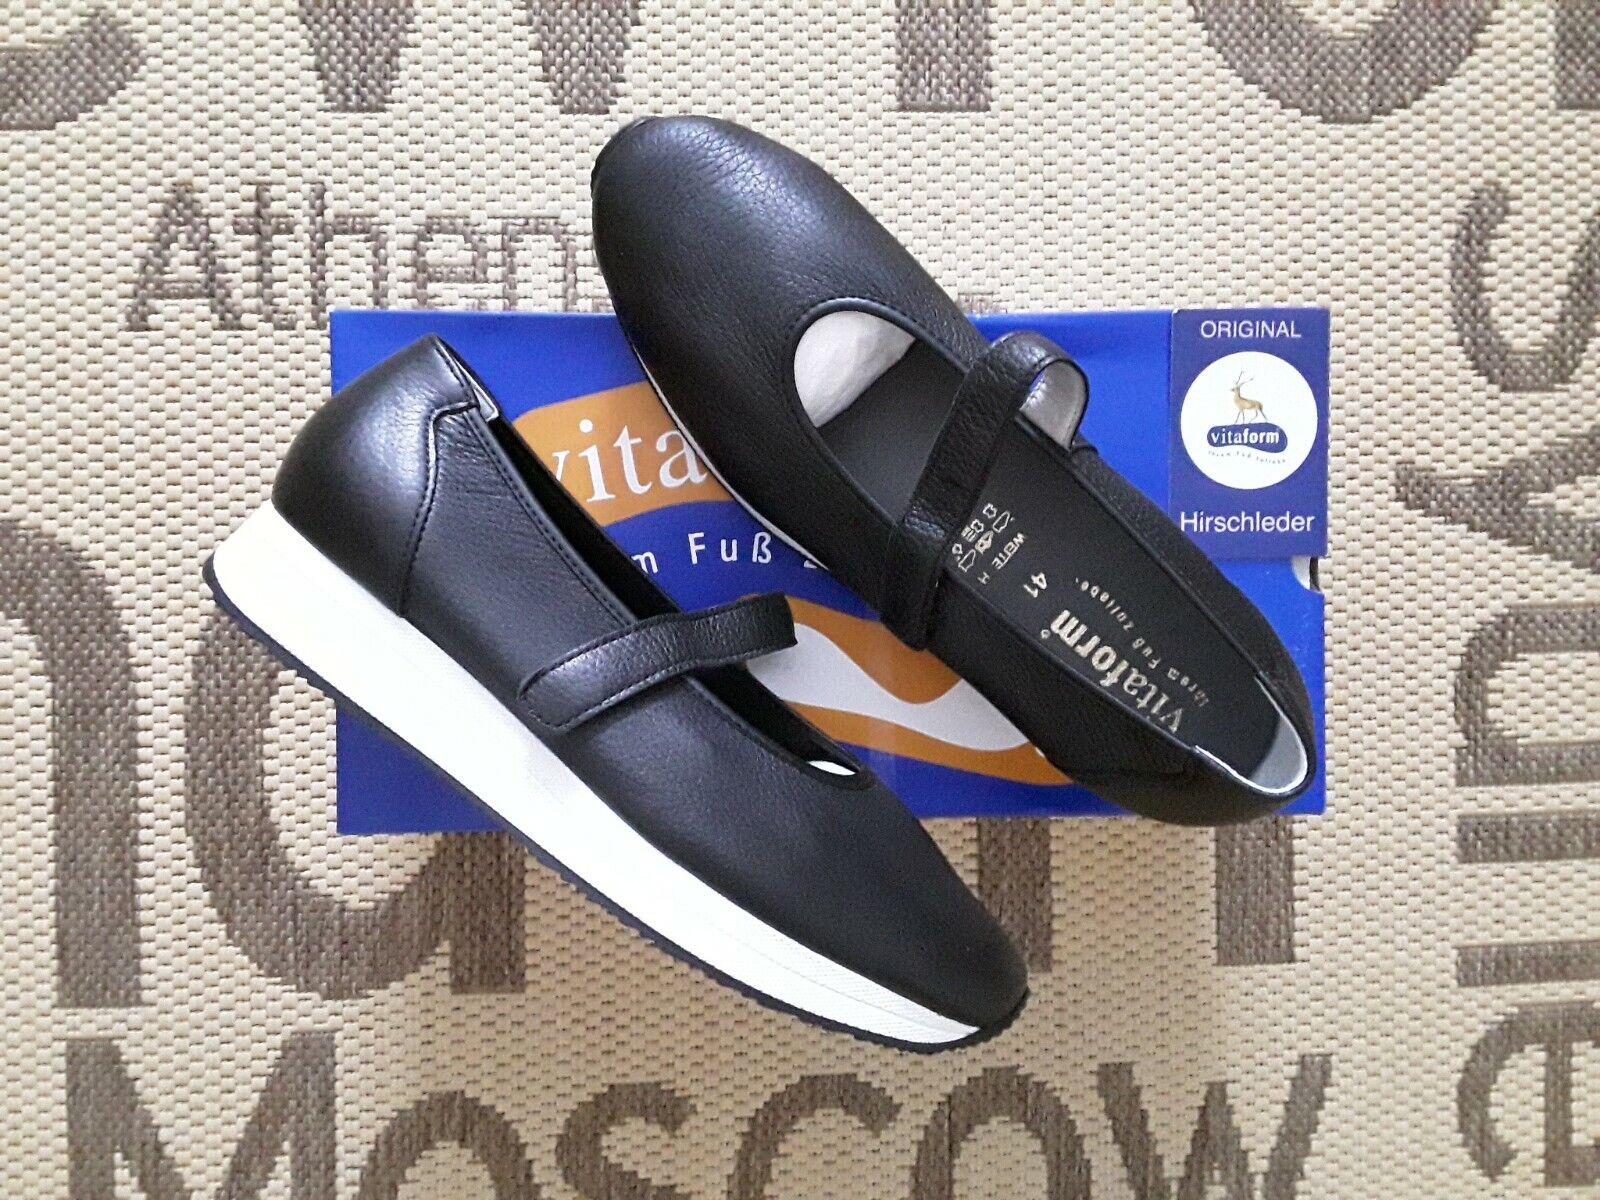 Schuhe, Leder Anti VITAFORM %%% NEU 41, Grosse Shock